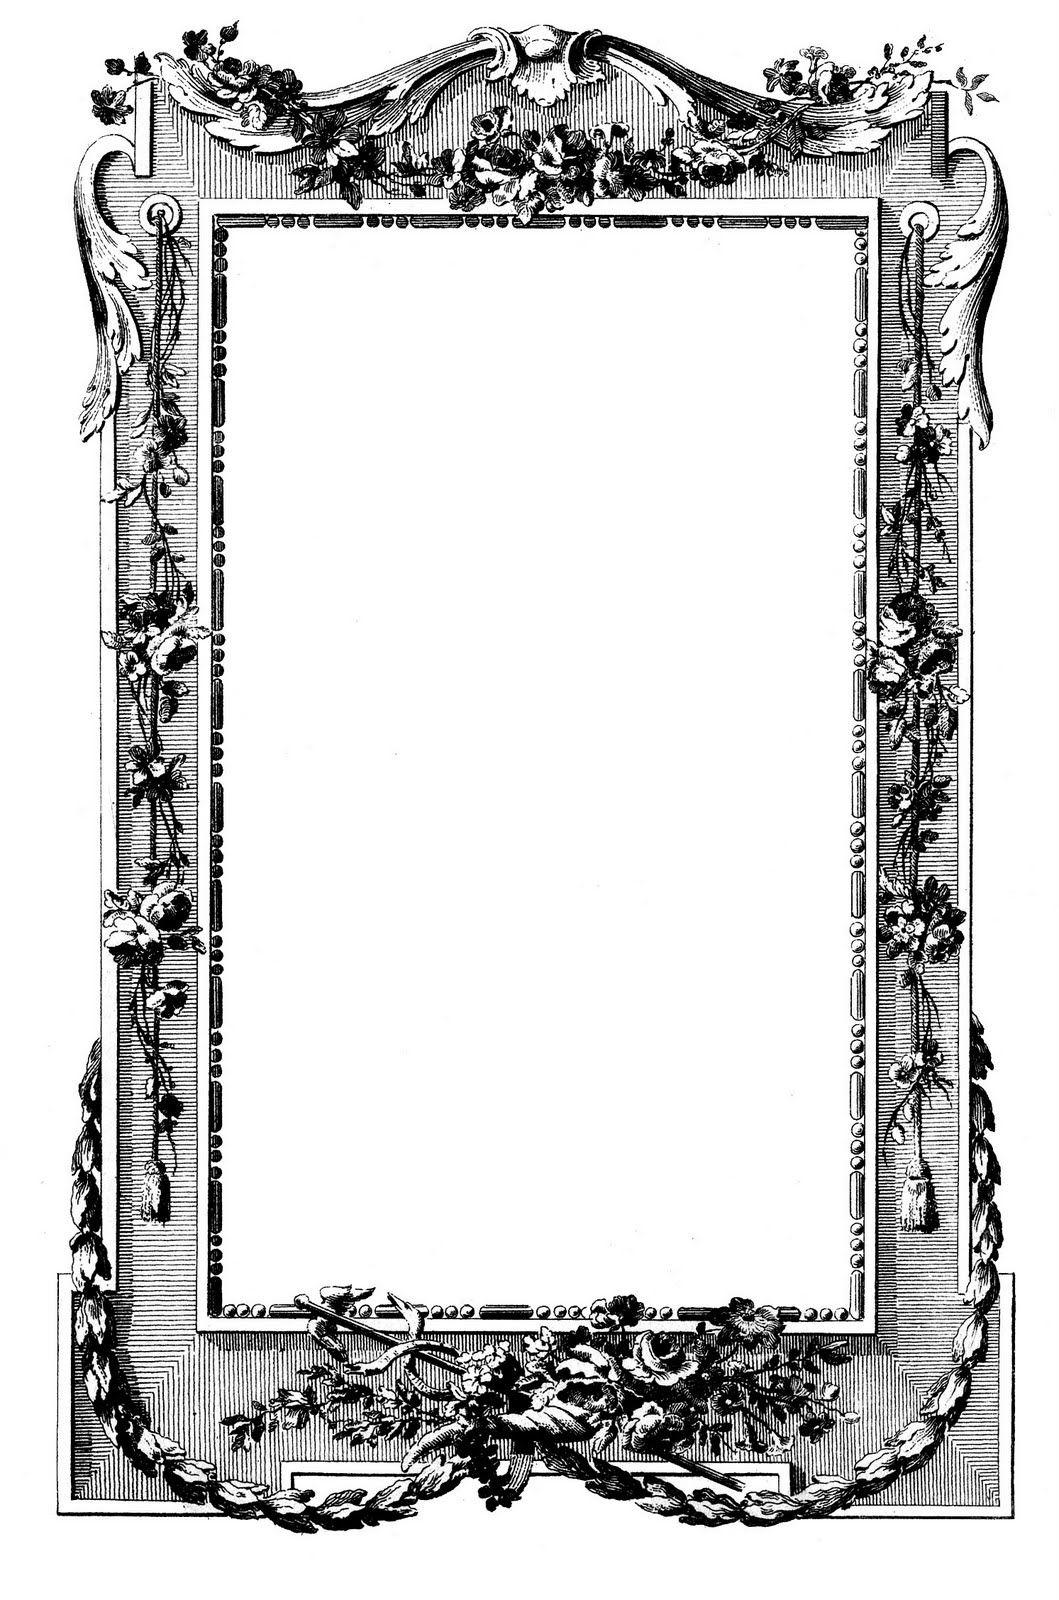 French Graphicframe Graphicsfairy001a Jpg Jpeg Image 1059x1600 Pixels Scal Printable Frames Clip Art Vintage Antique Images